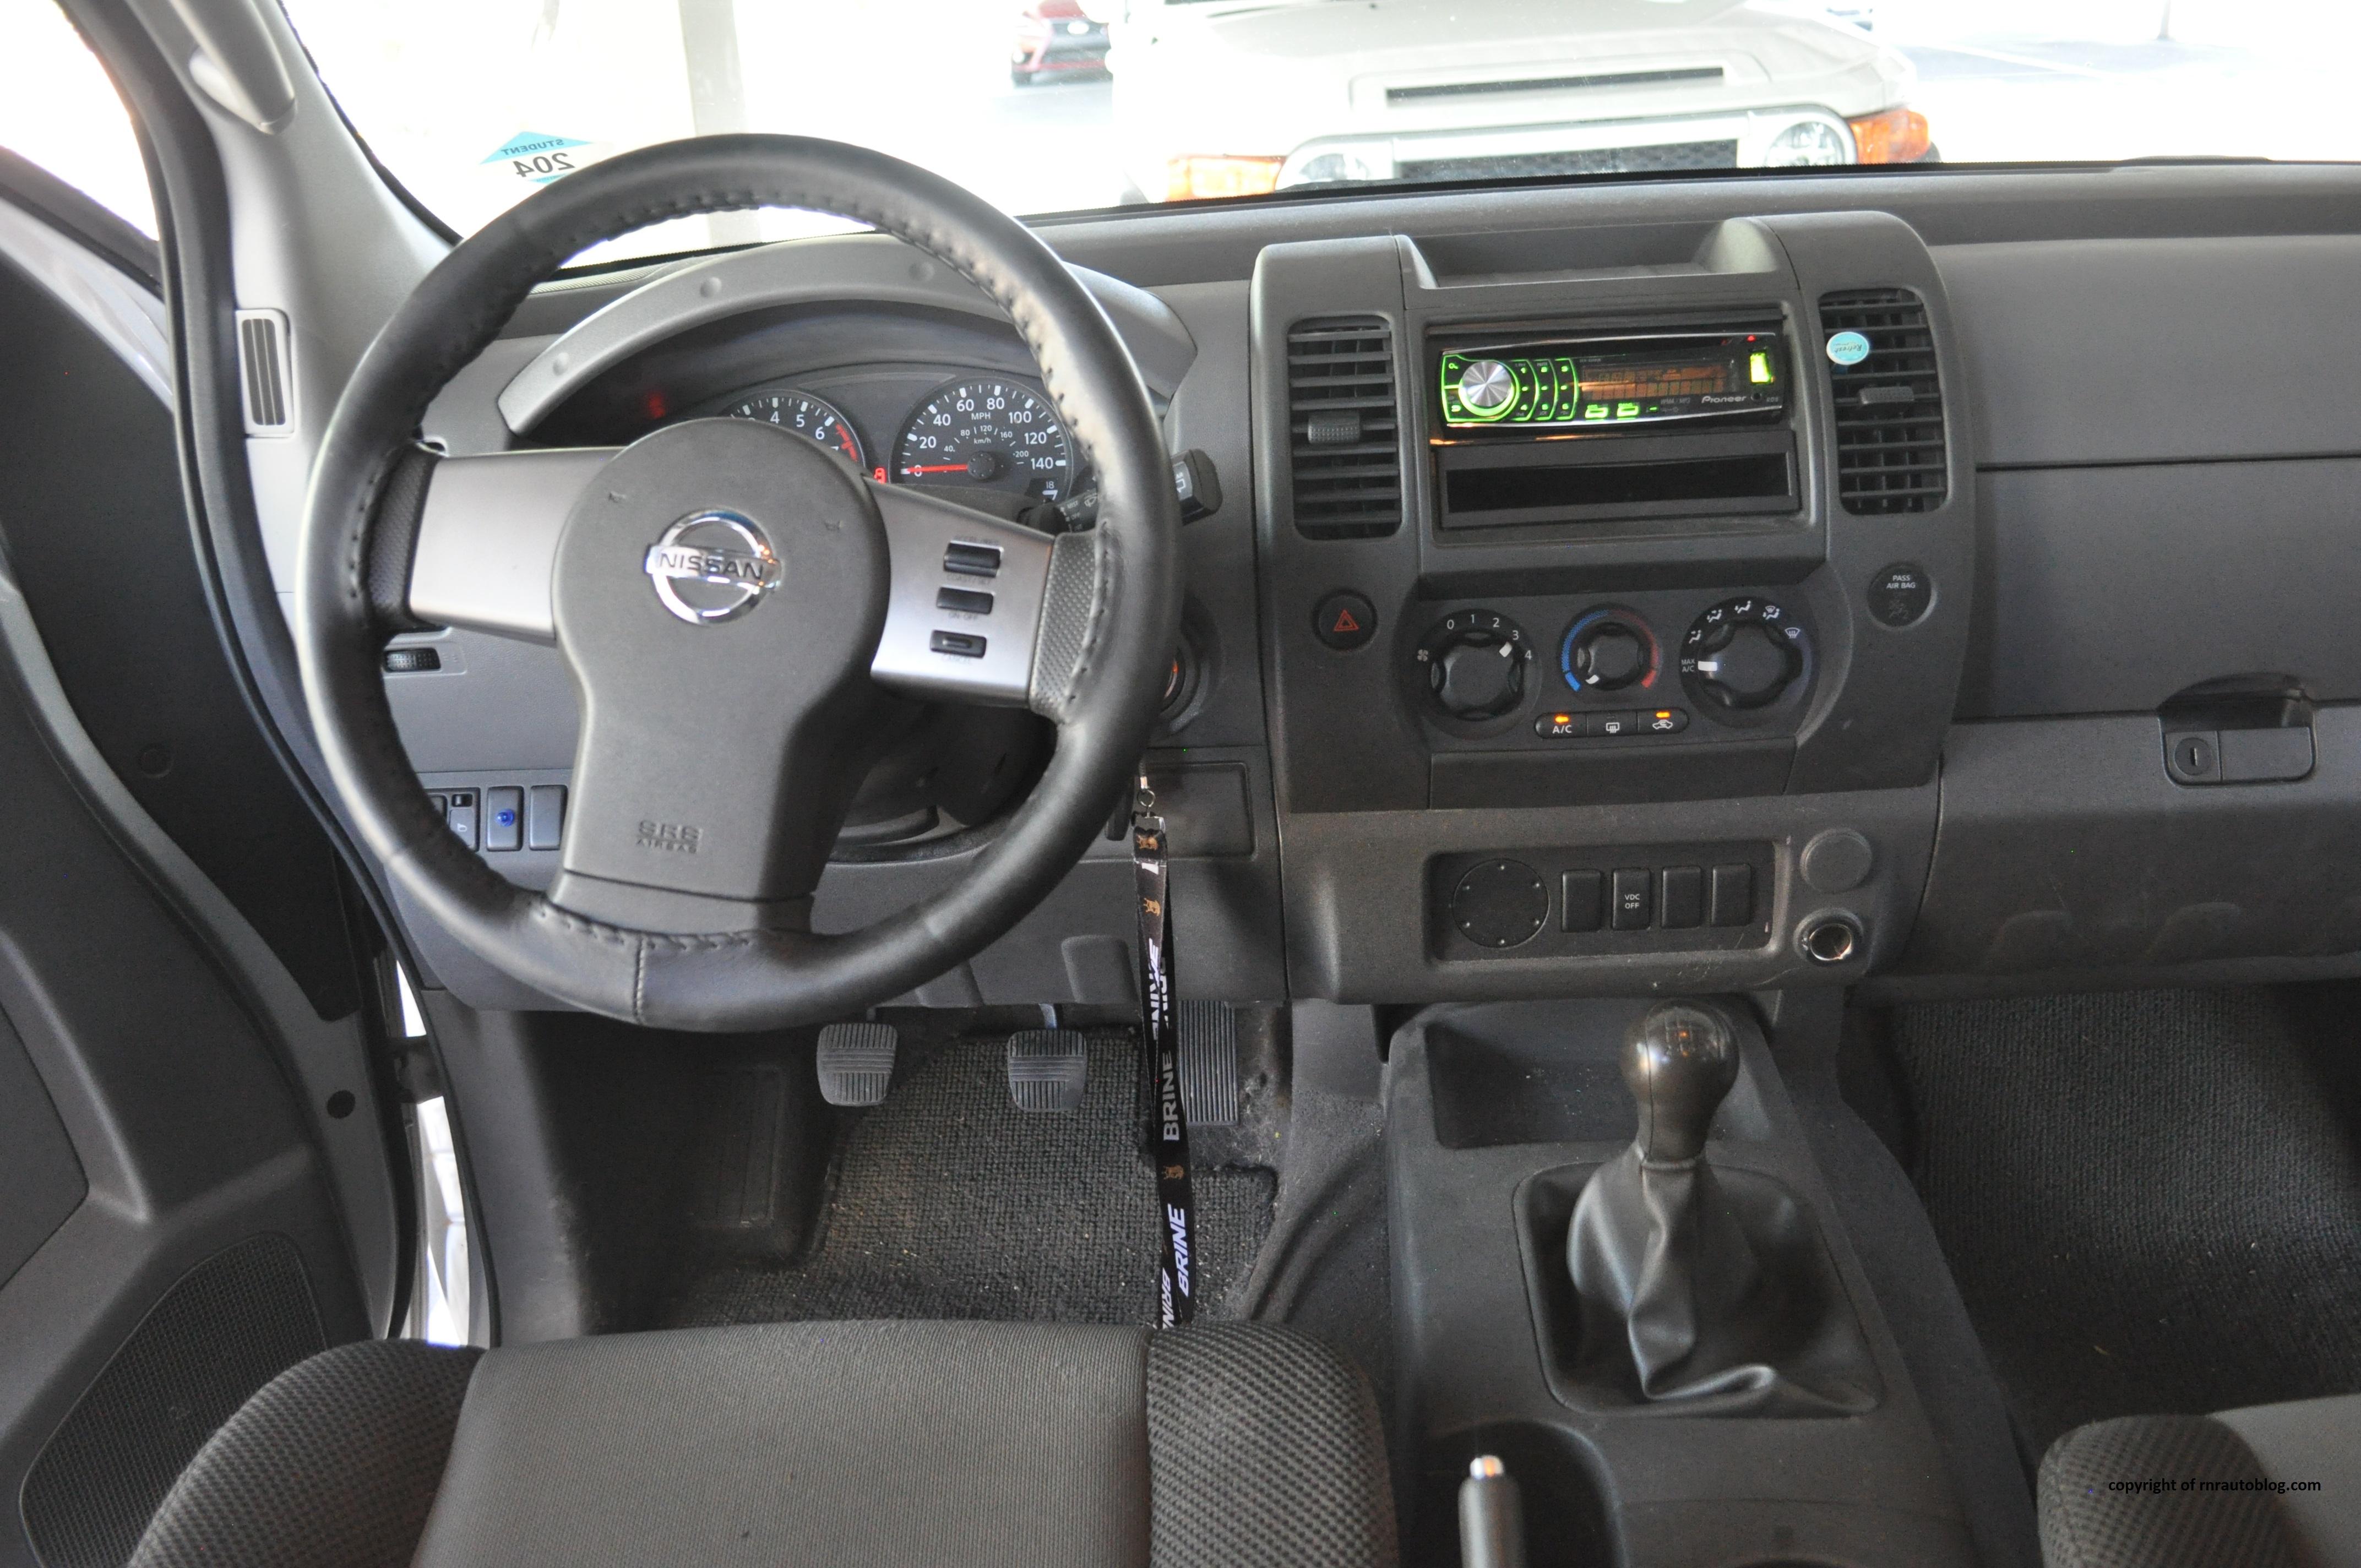 2007 nissan xterra x review rnr automotive blog rh rnrautoblog com  manual de nissan xterra 2004